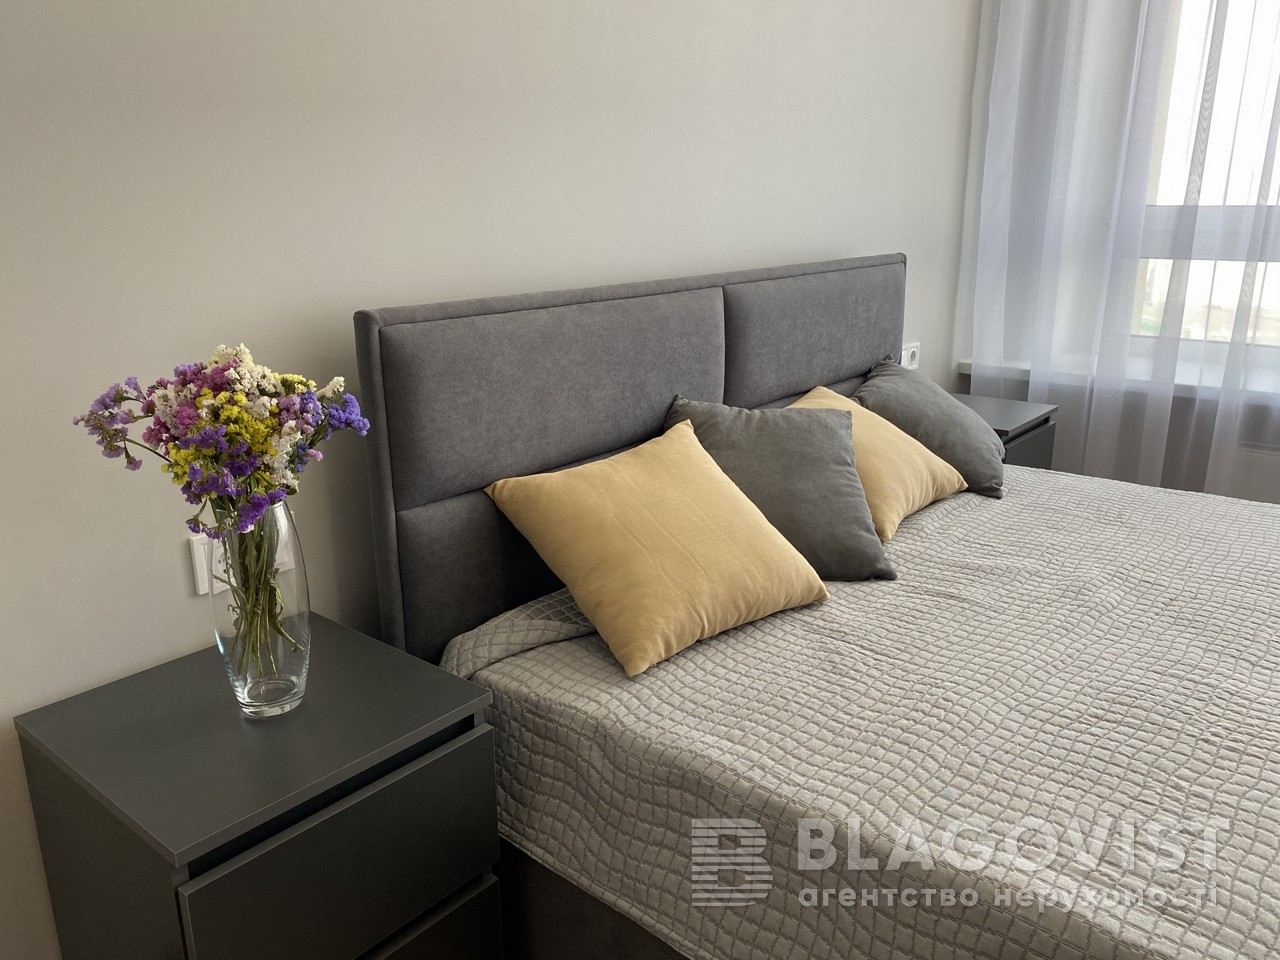 Квартира R-39866, Заречная, 2 корпус 2, Киев - Фото 9